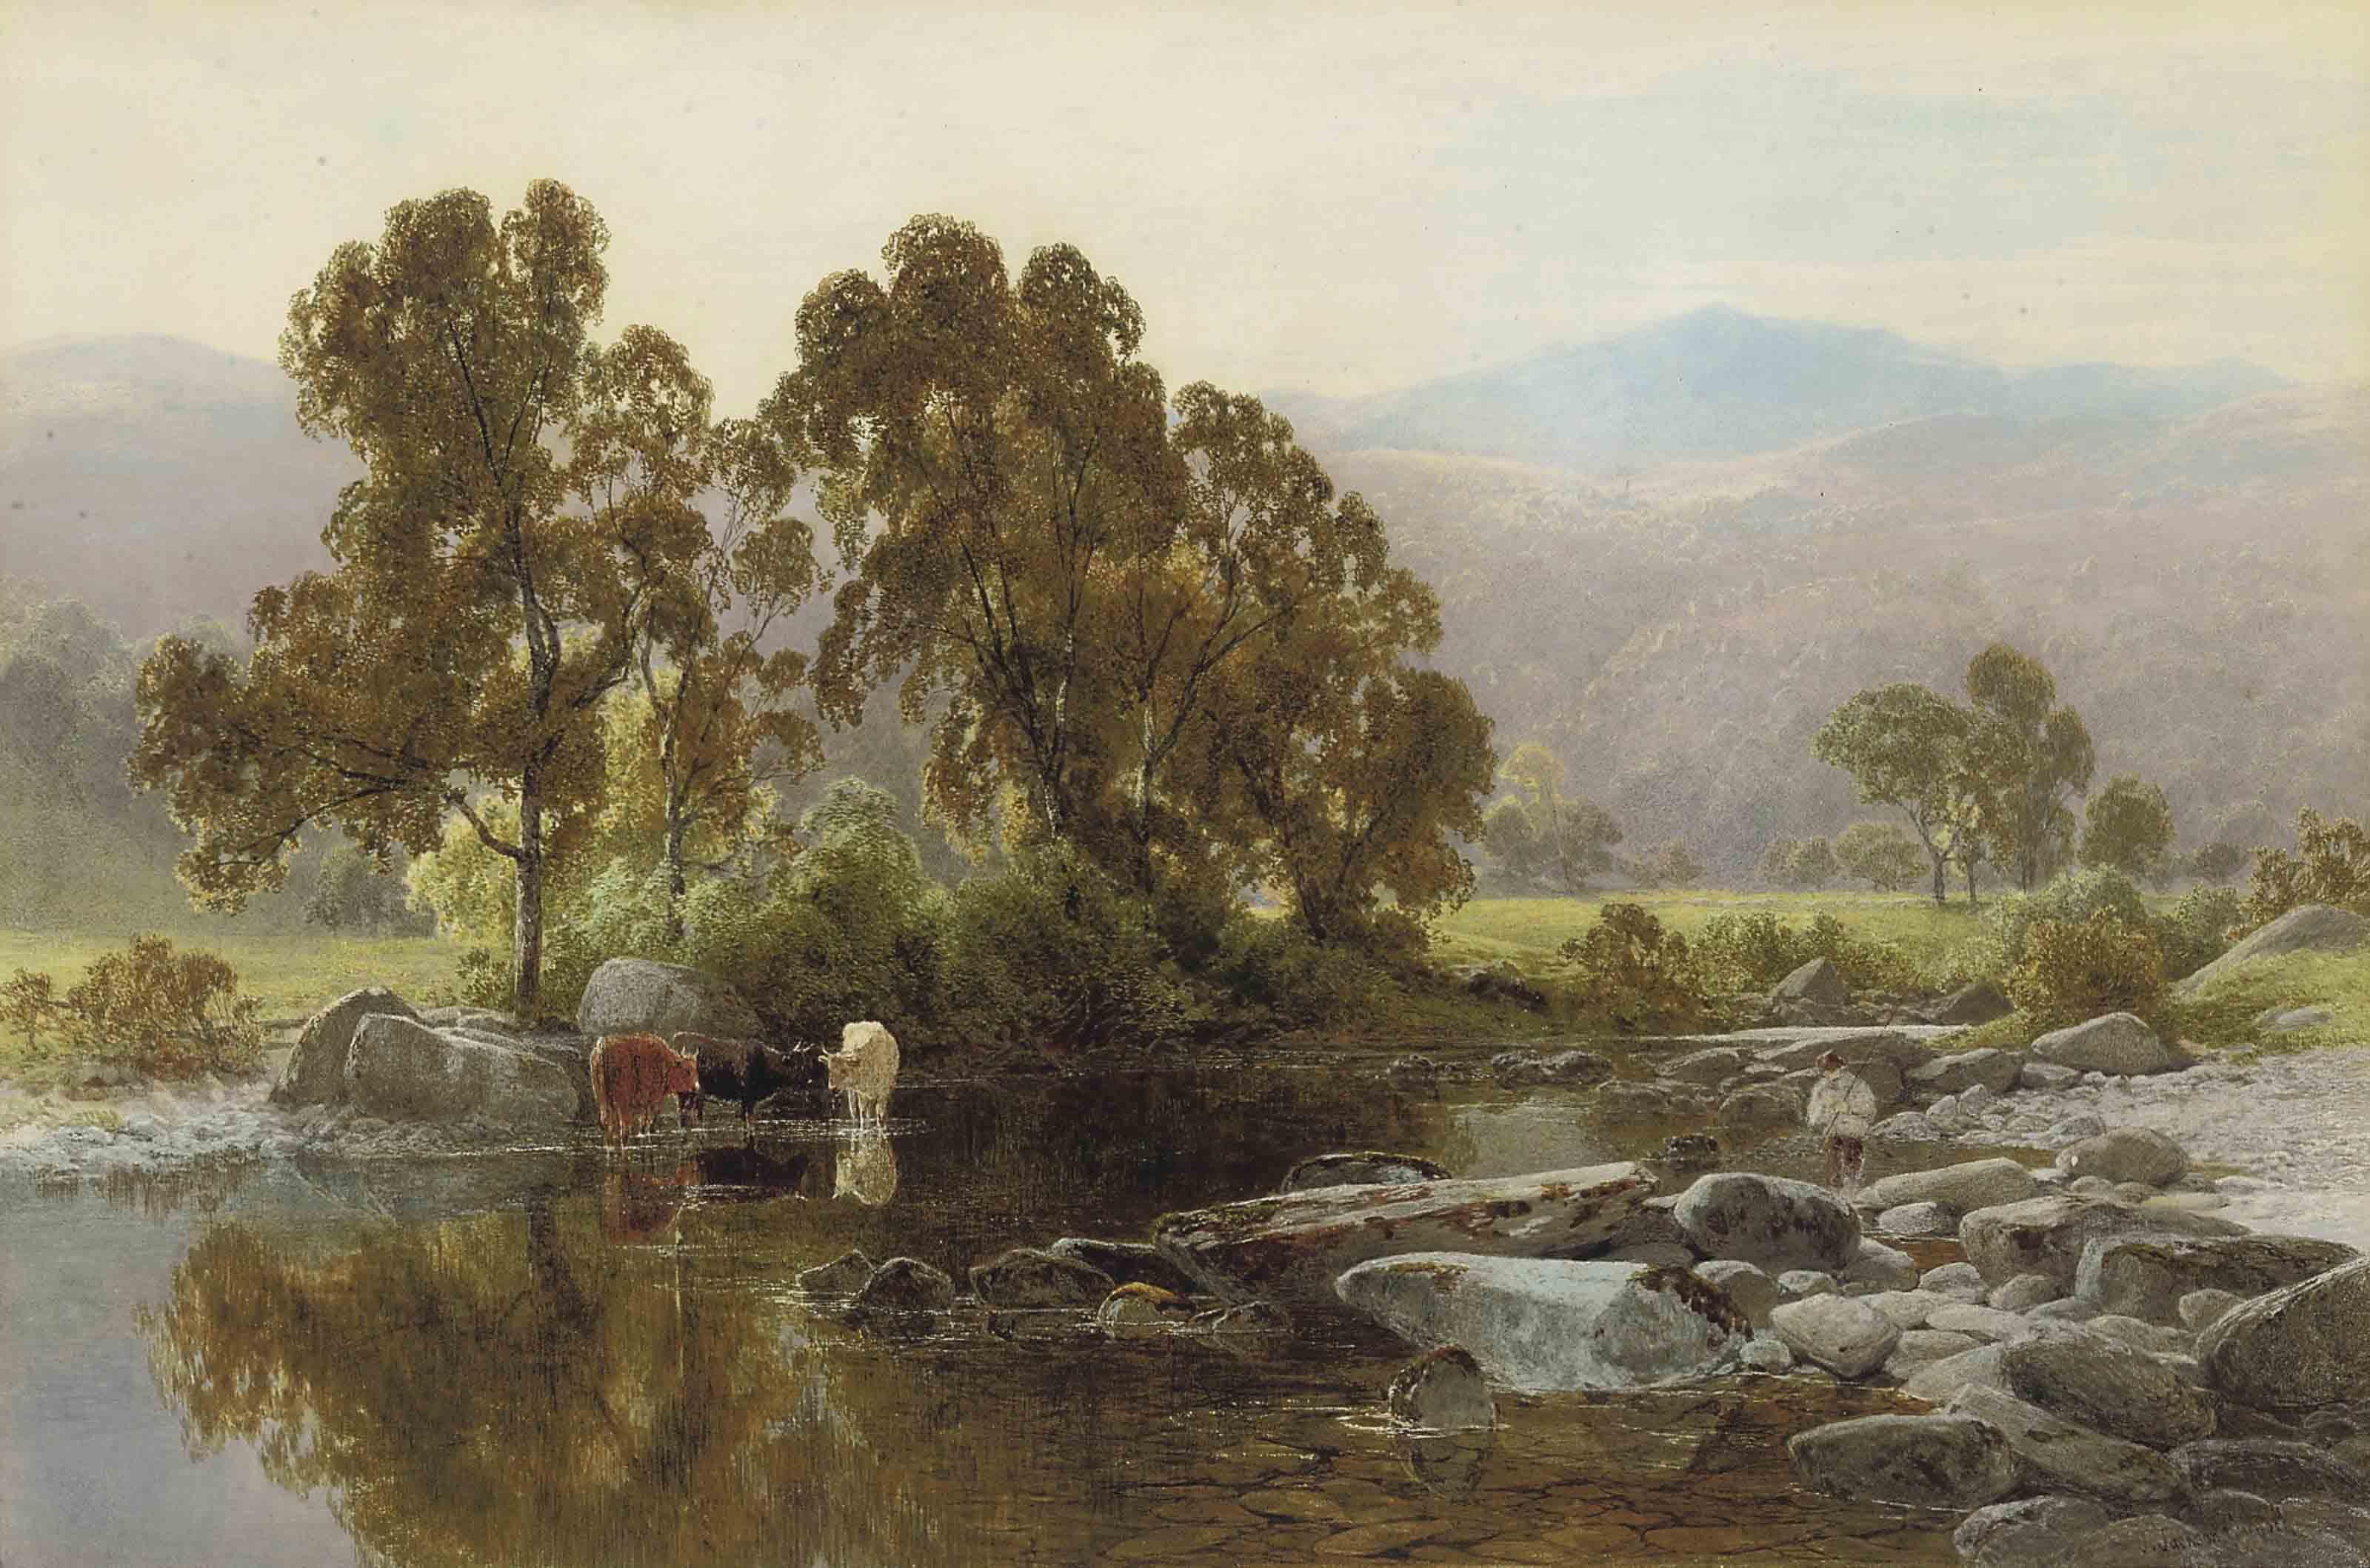 The riverside at Capel Curig, Wales